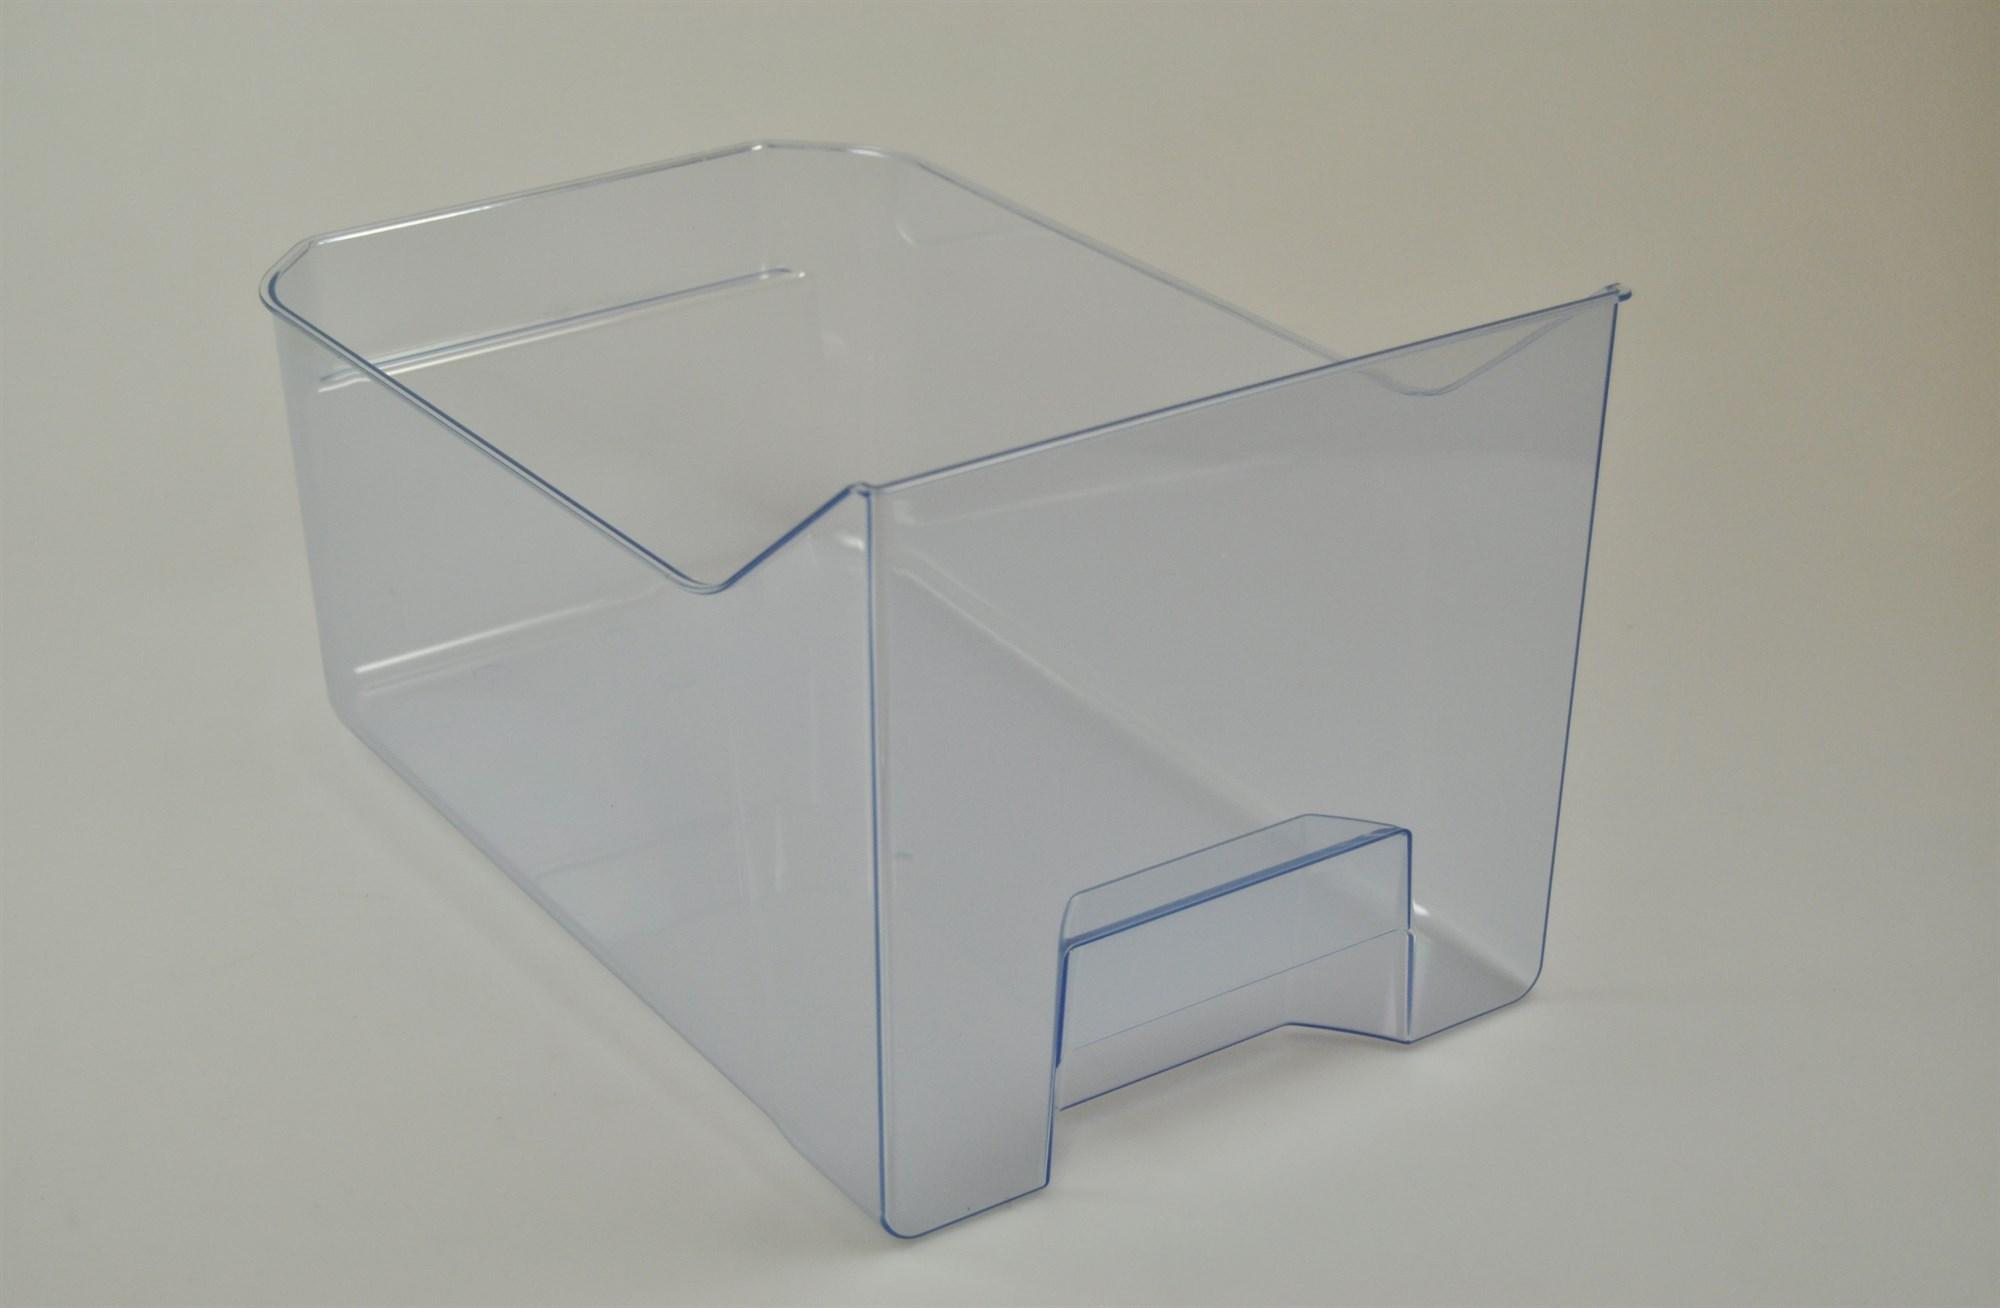 bac l gume gorenje frigo cong lateur 225mm x 240mm x 395mm. Black Bedroom Furniture Sets. Home Design Ideas